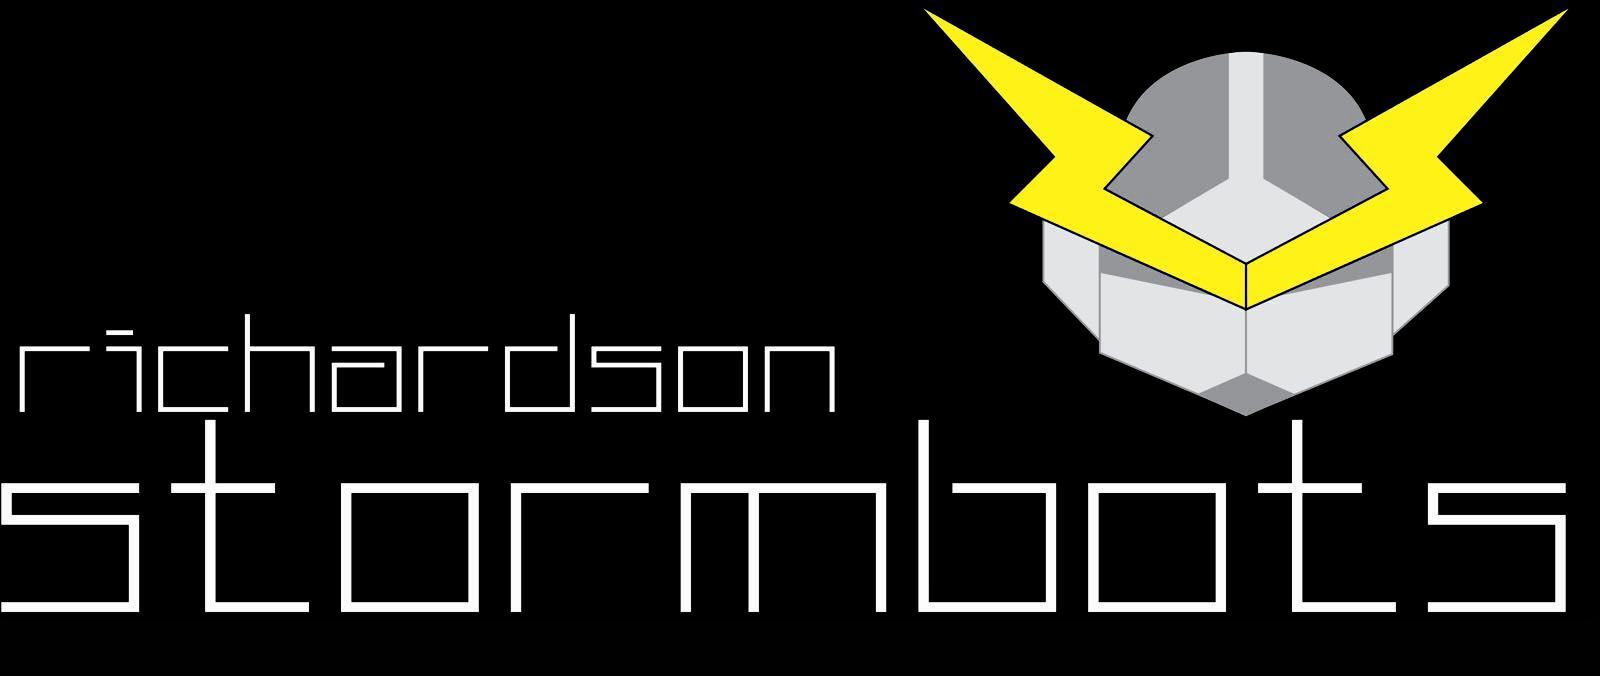 Team 5076: Stormbots